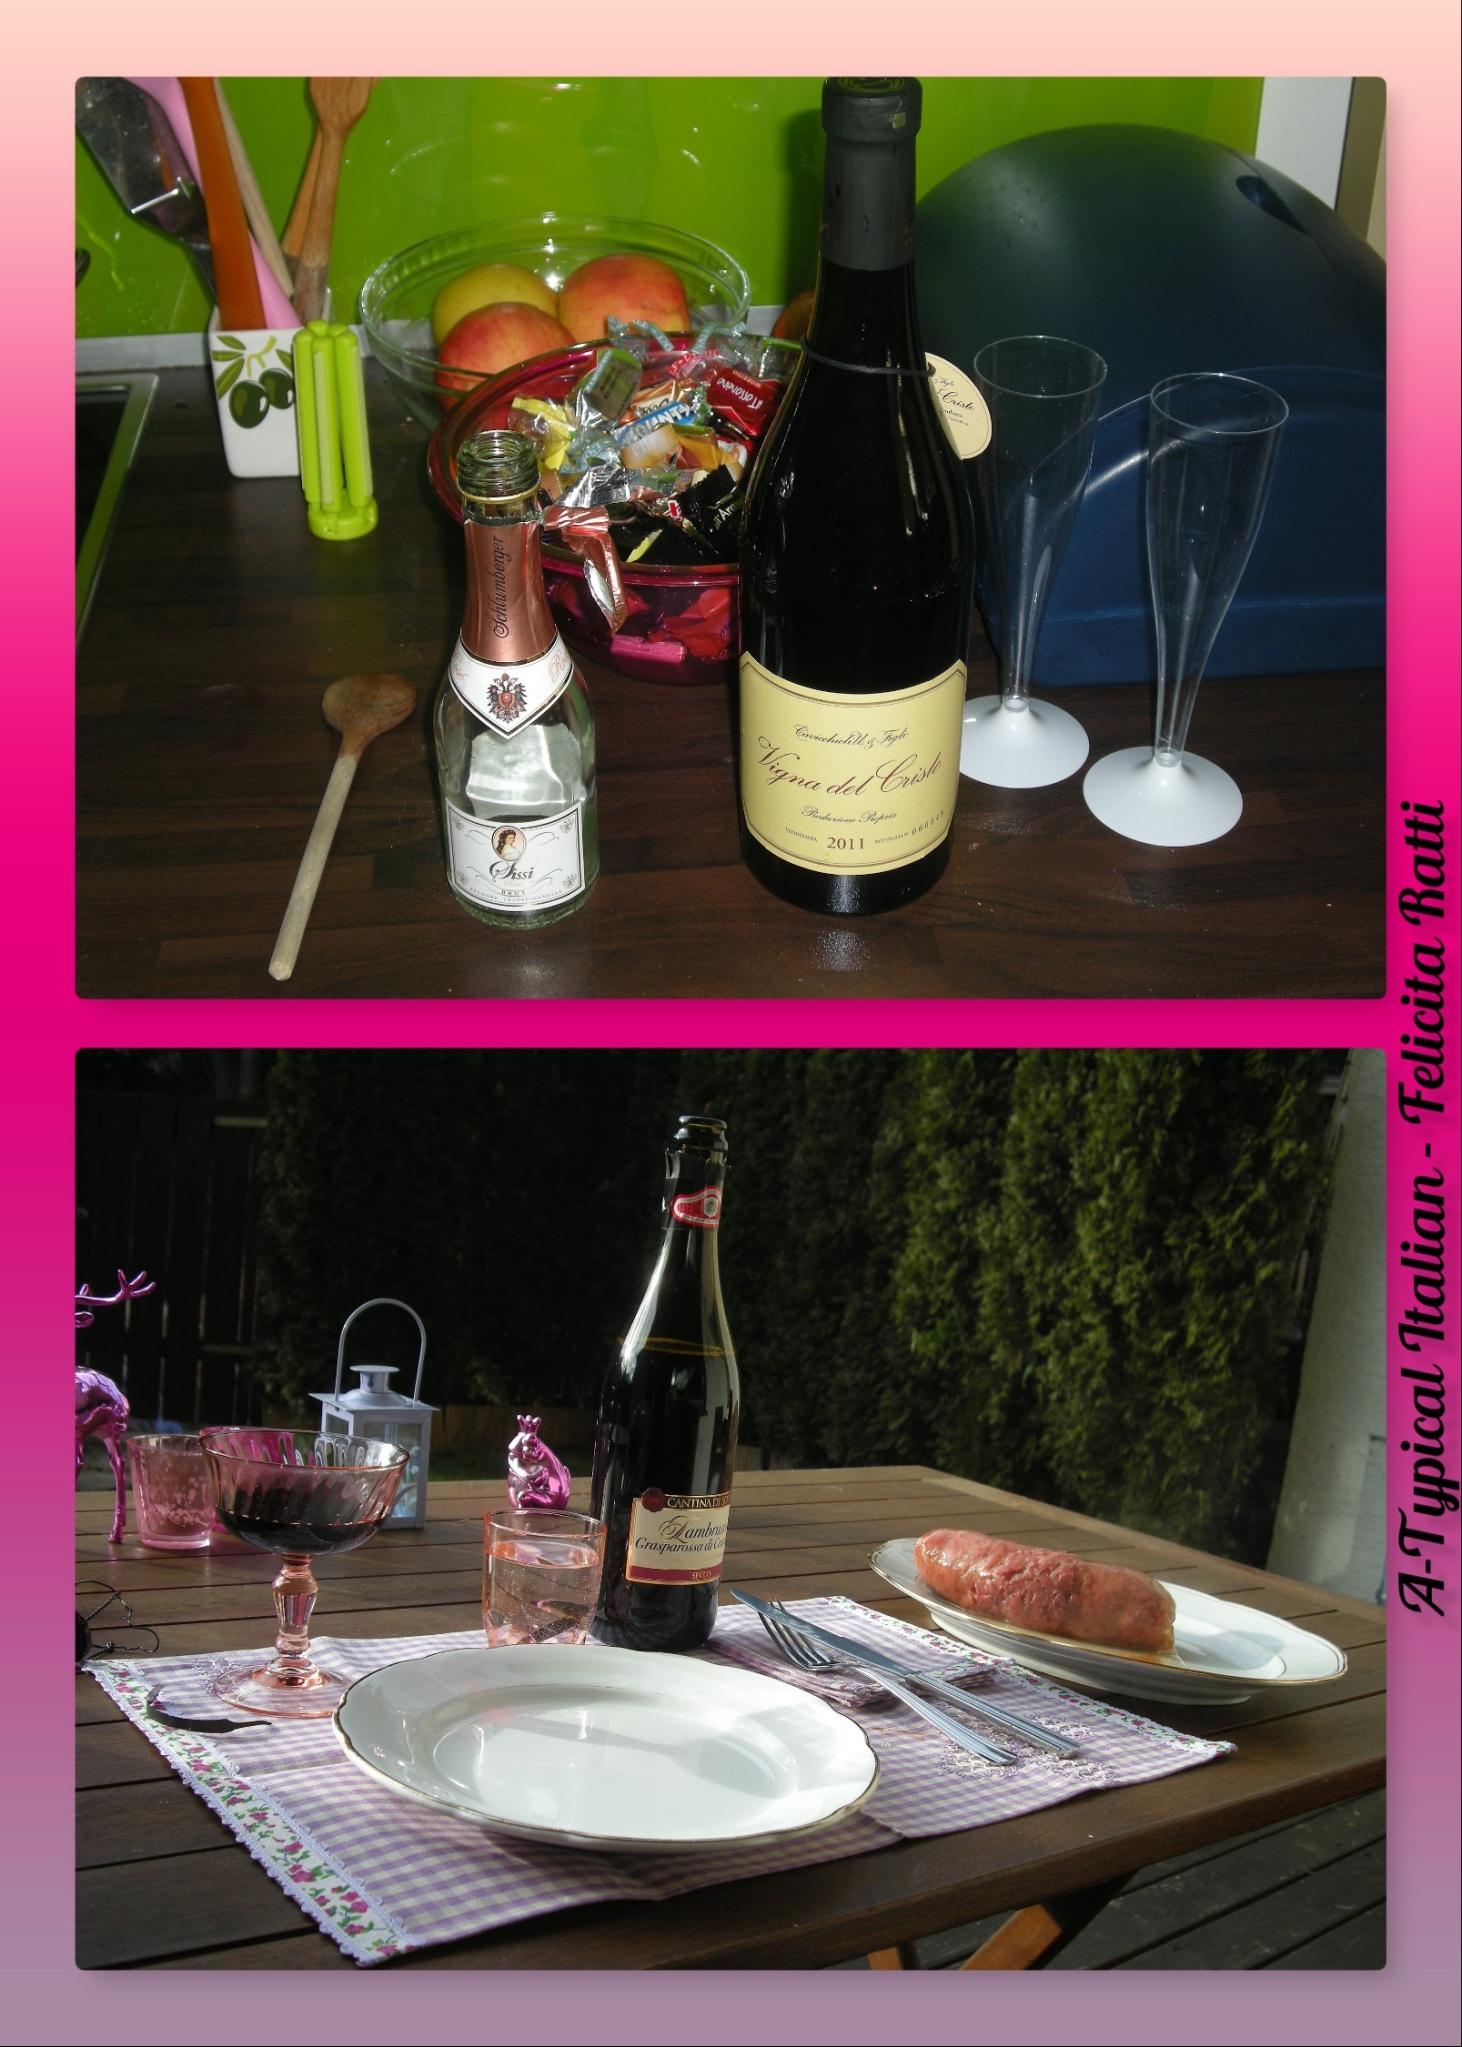 Italian American Austrian Modenese New Year